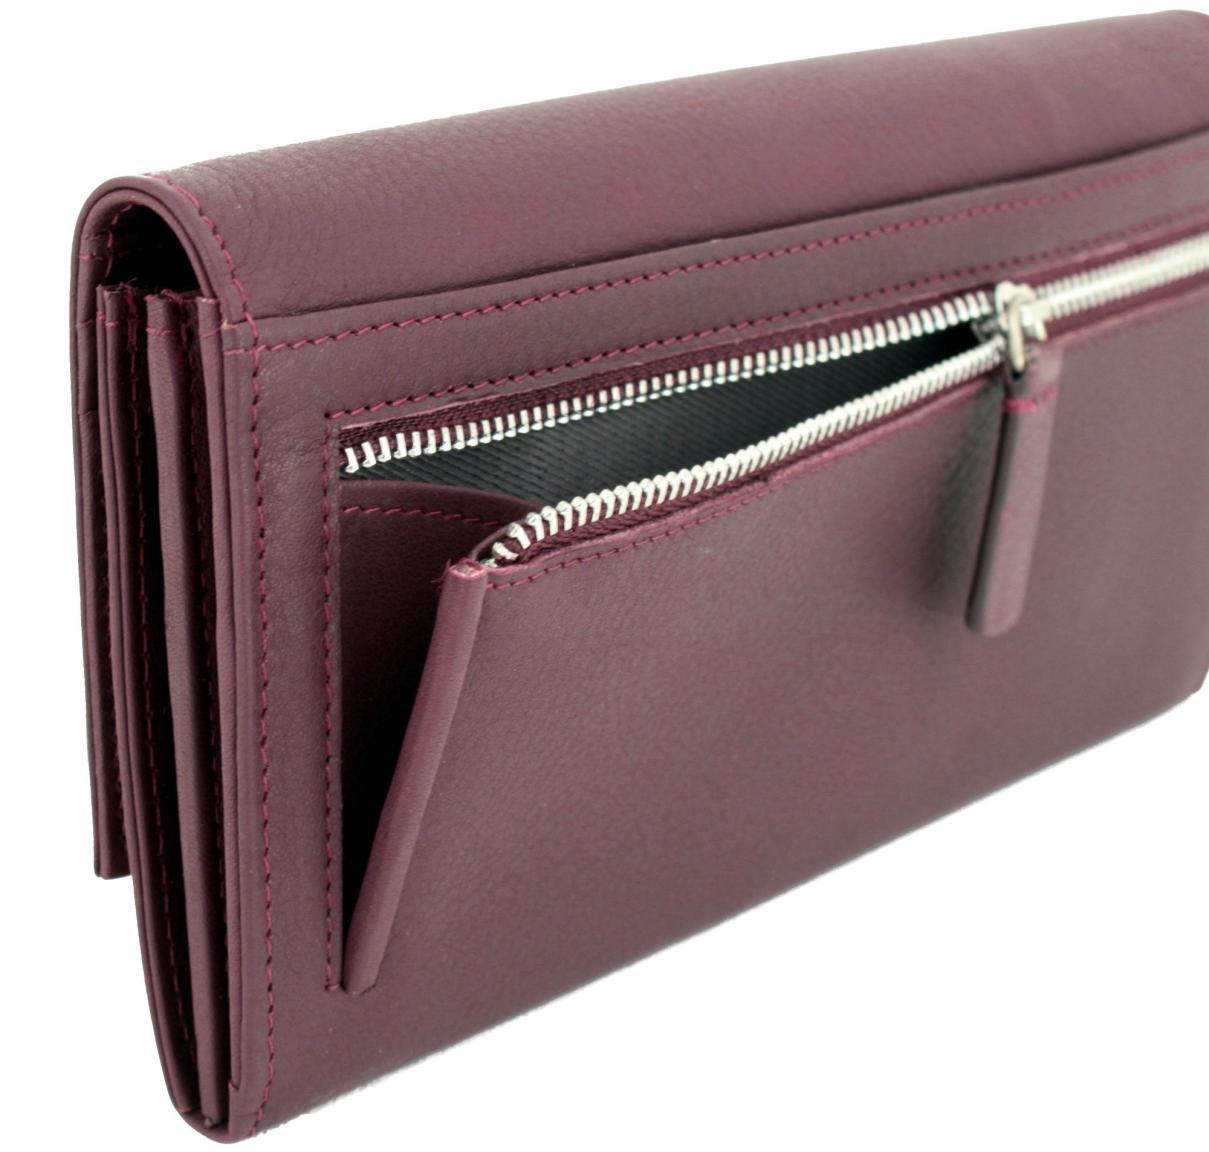 Gerry Weber Geldbörse Toledo burgundy violett